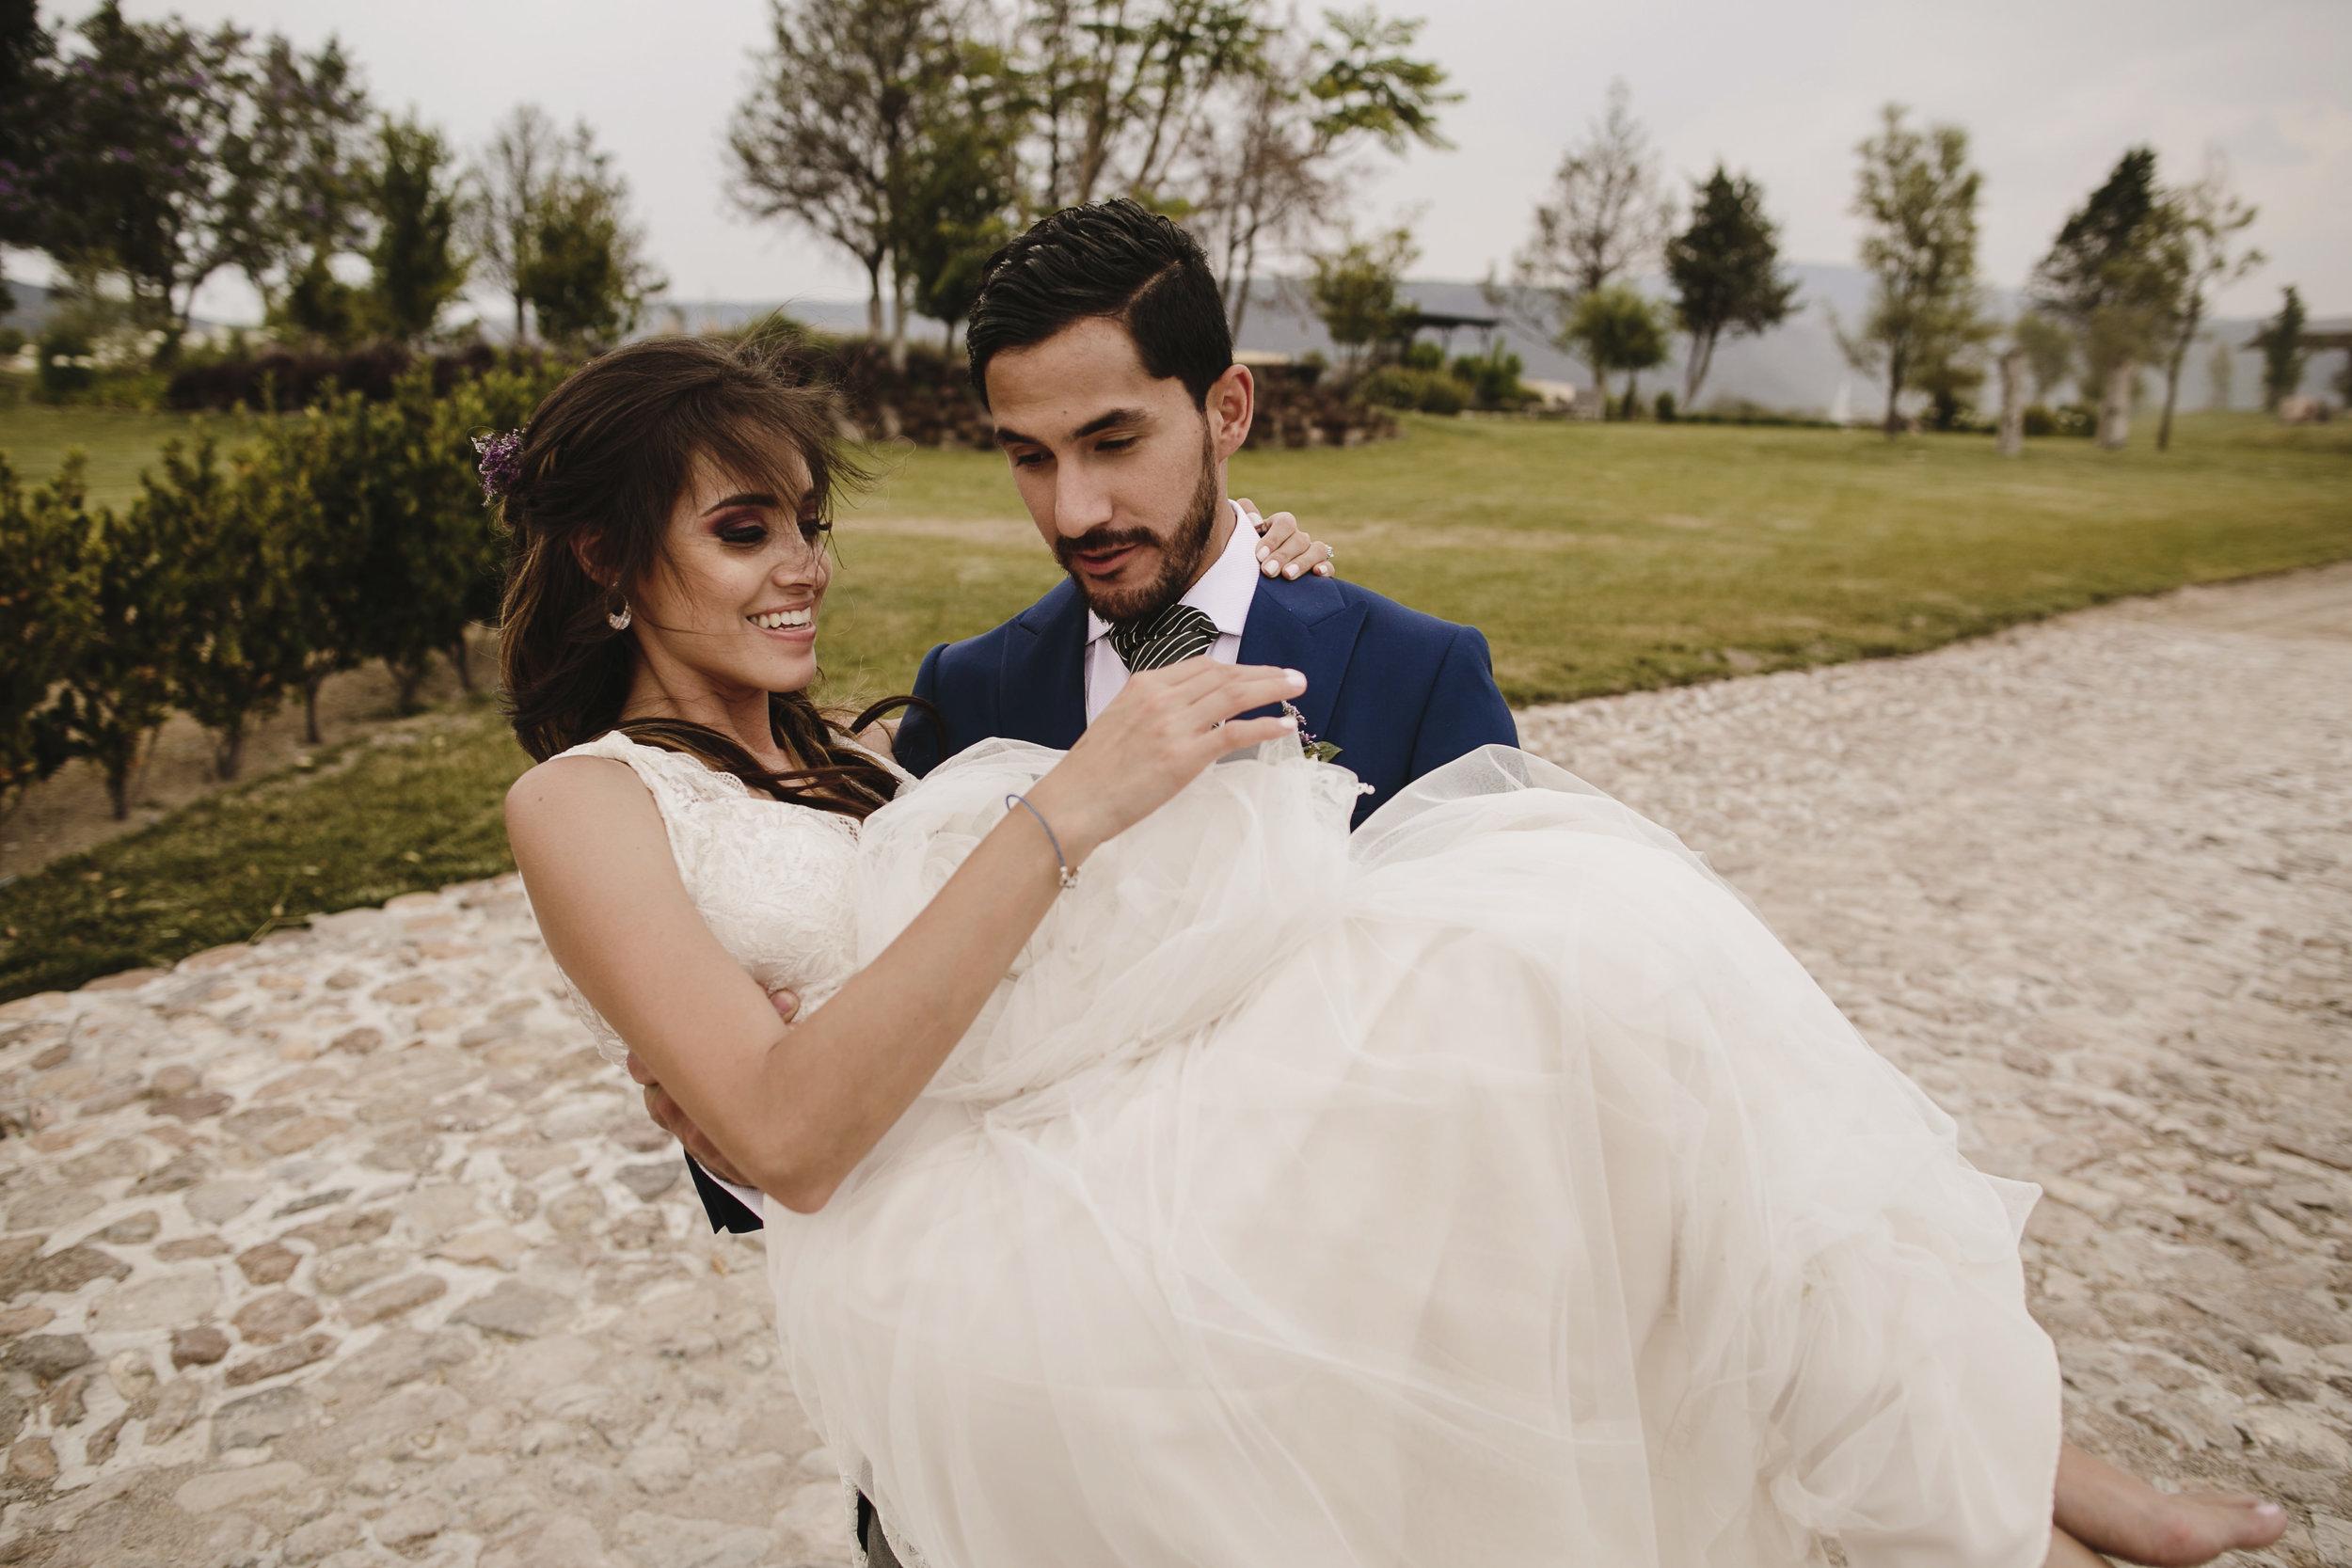 alfons_flores_destination_wedding_photography_mavi_david-1310.JPG